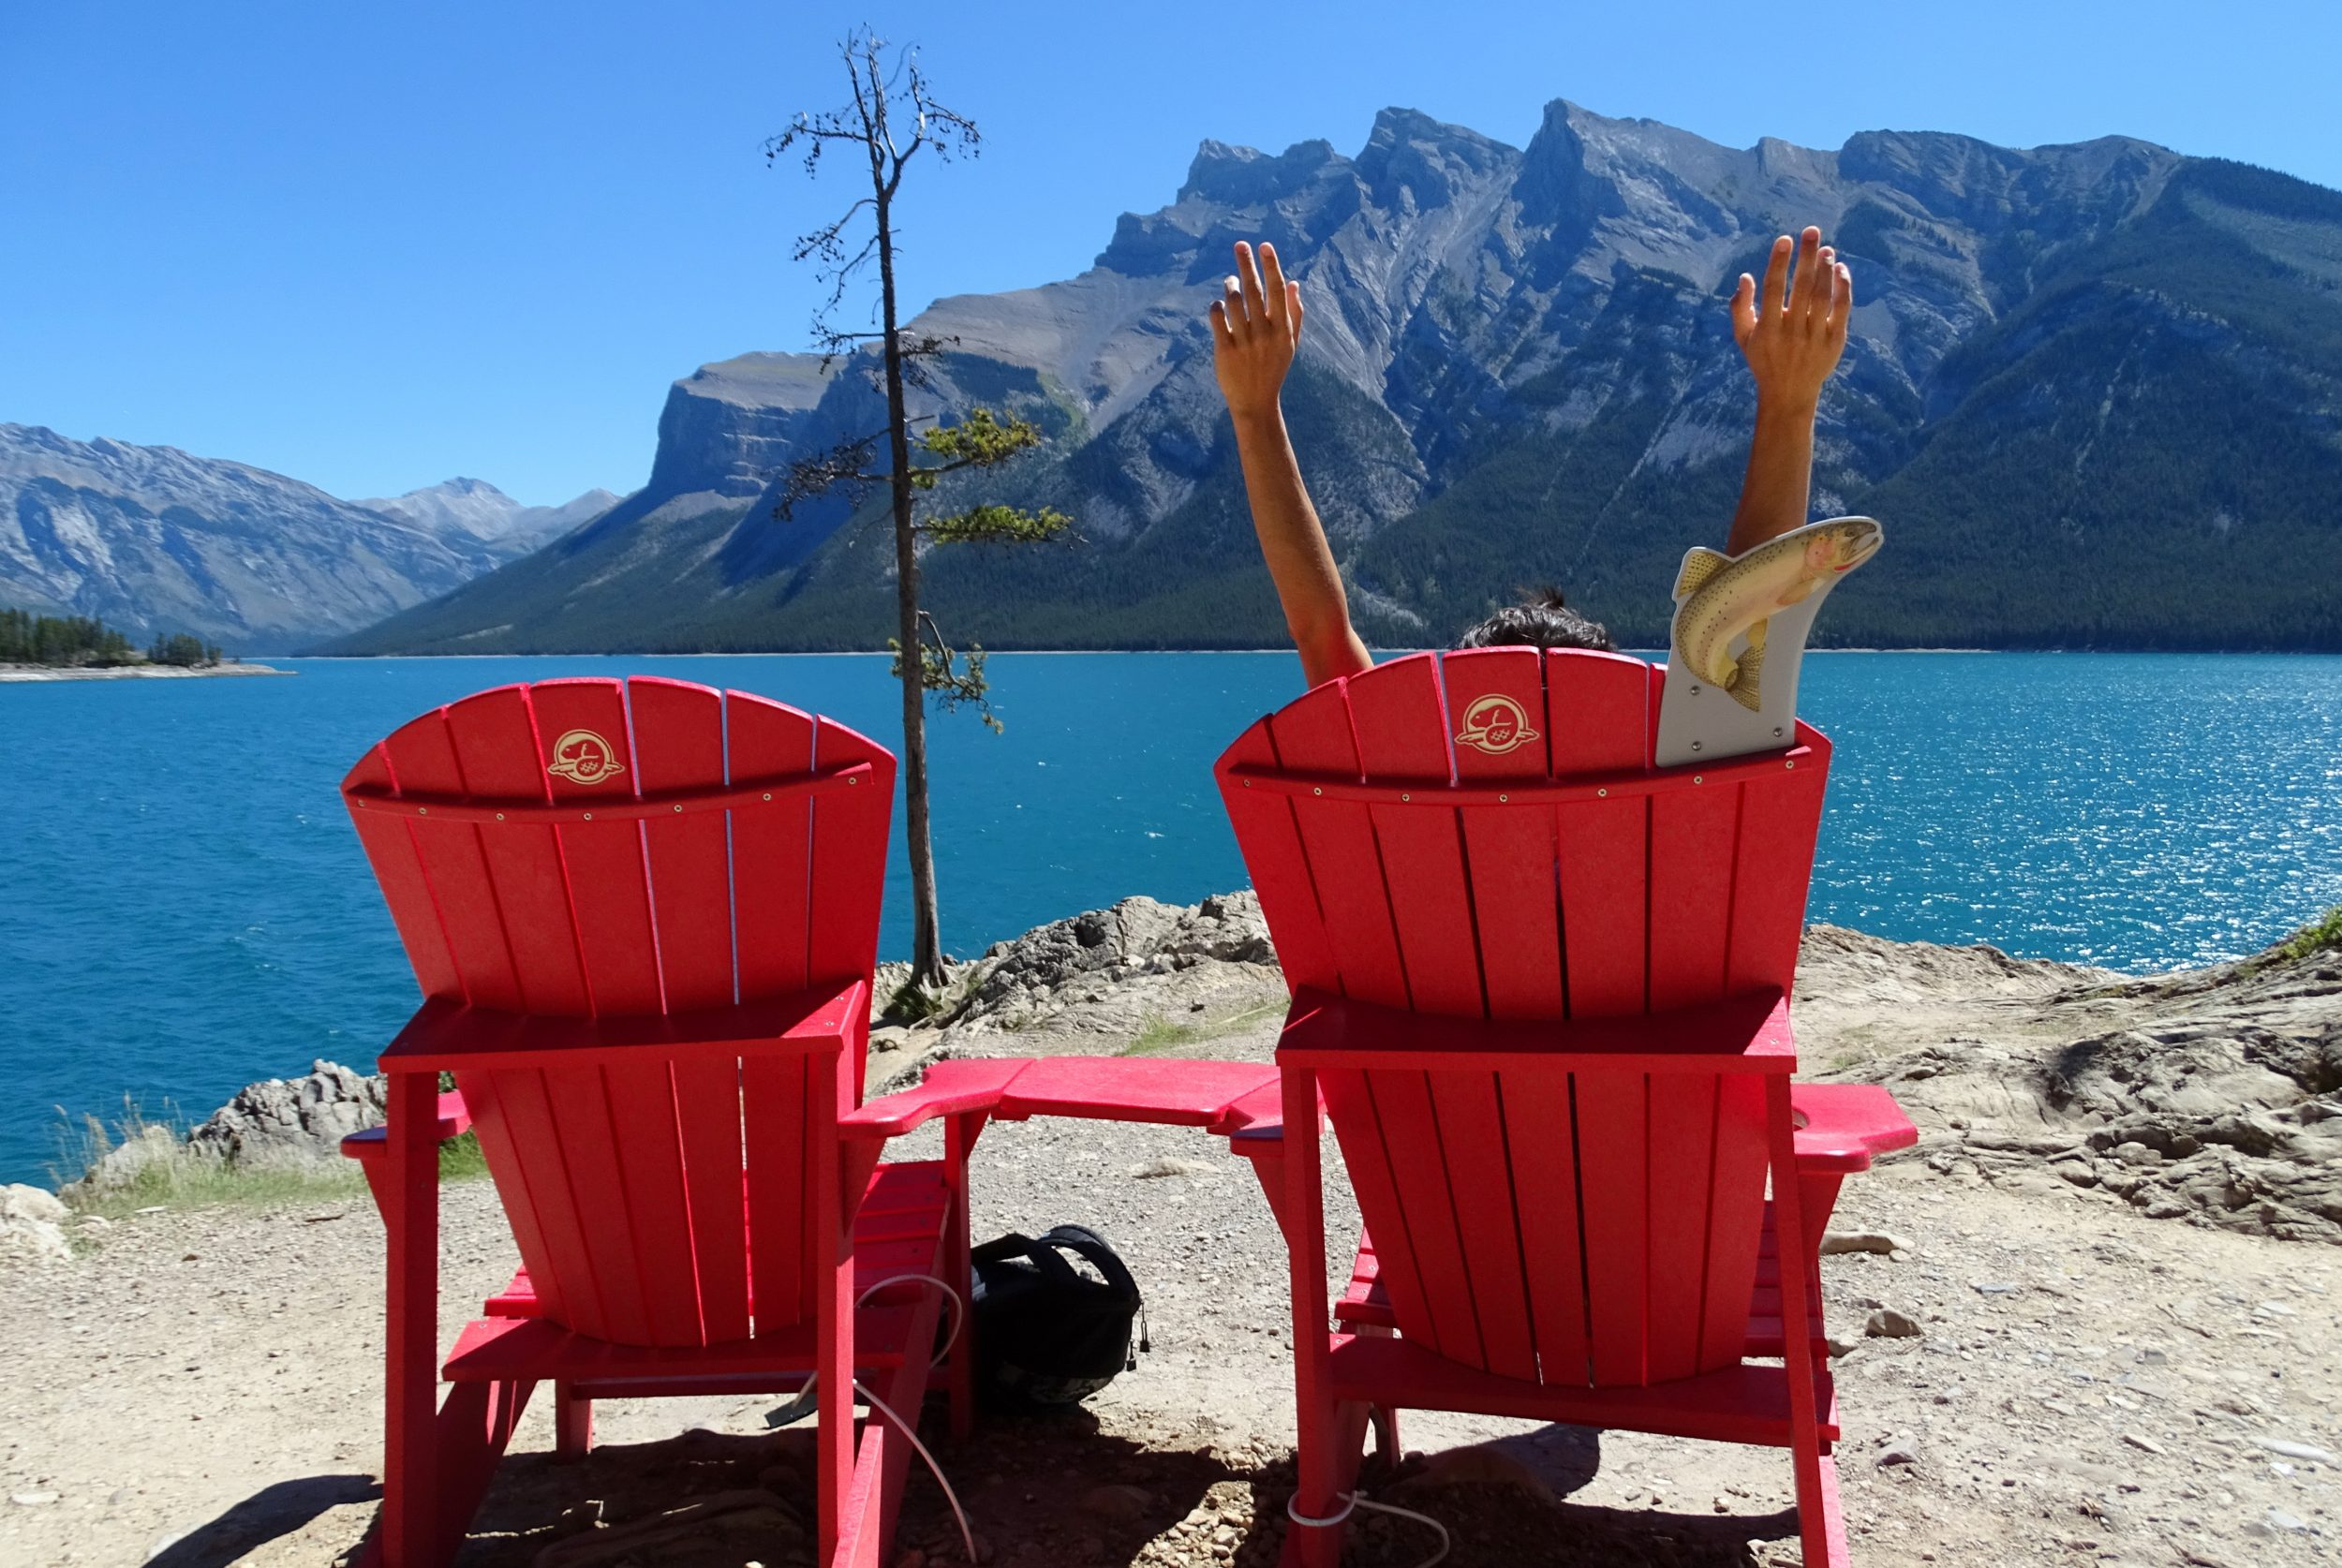 Red Chairs aan Lake Minnewanka Canada